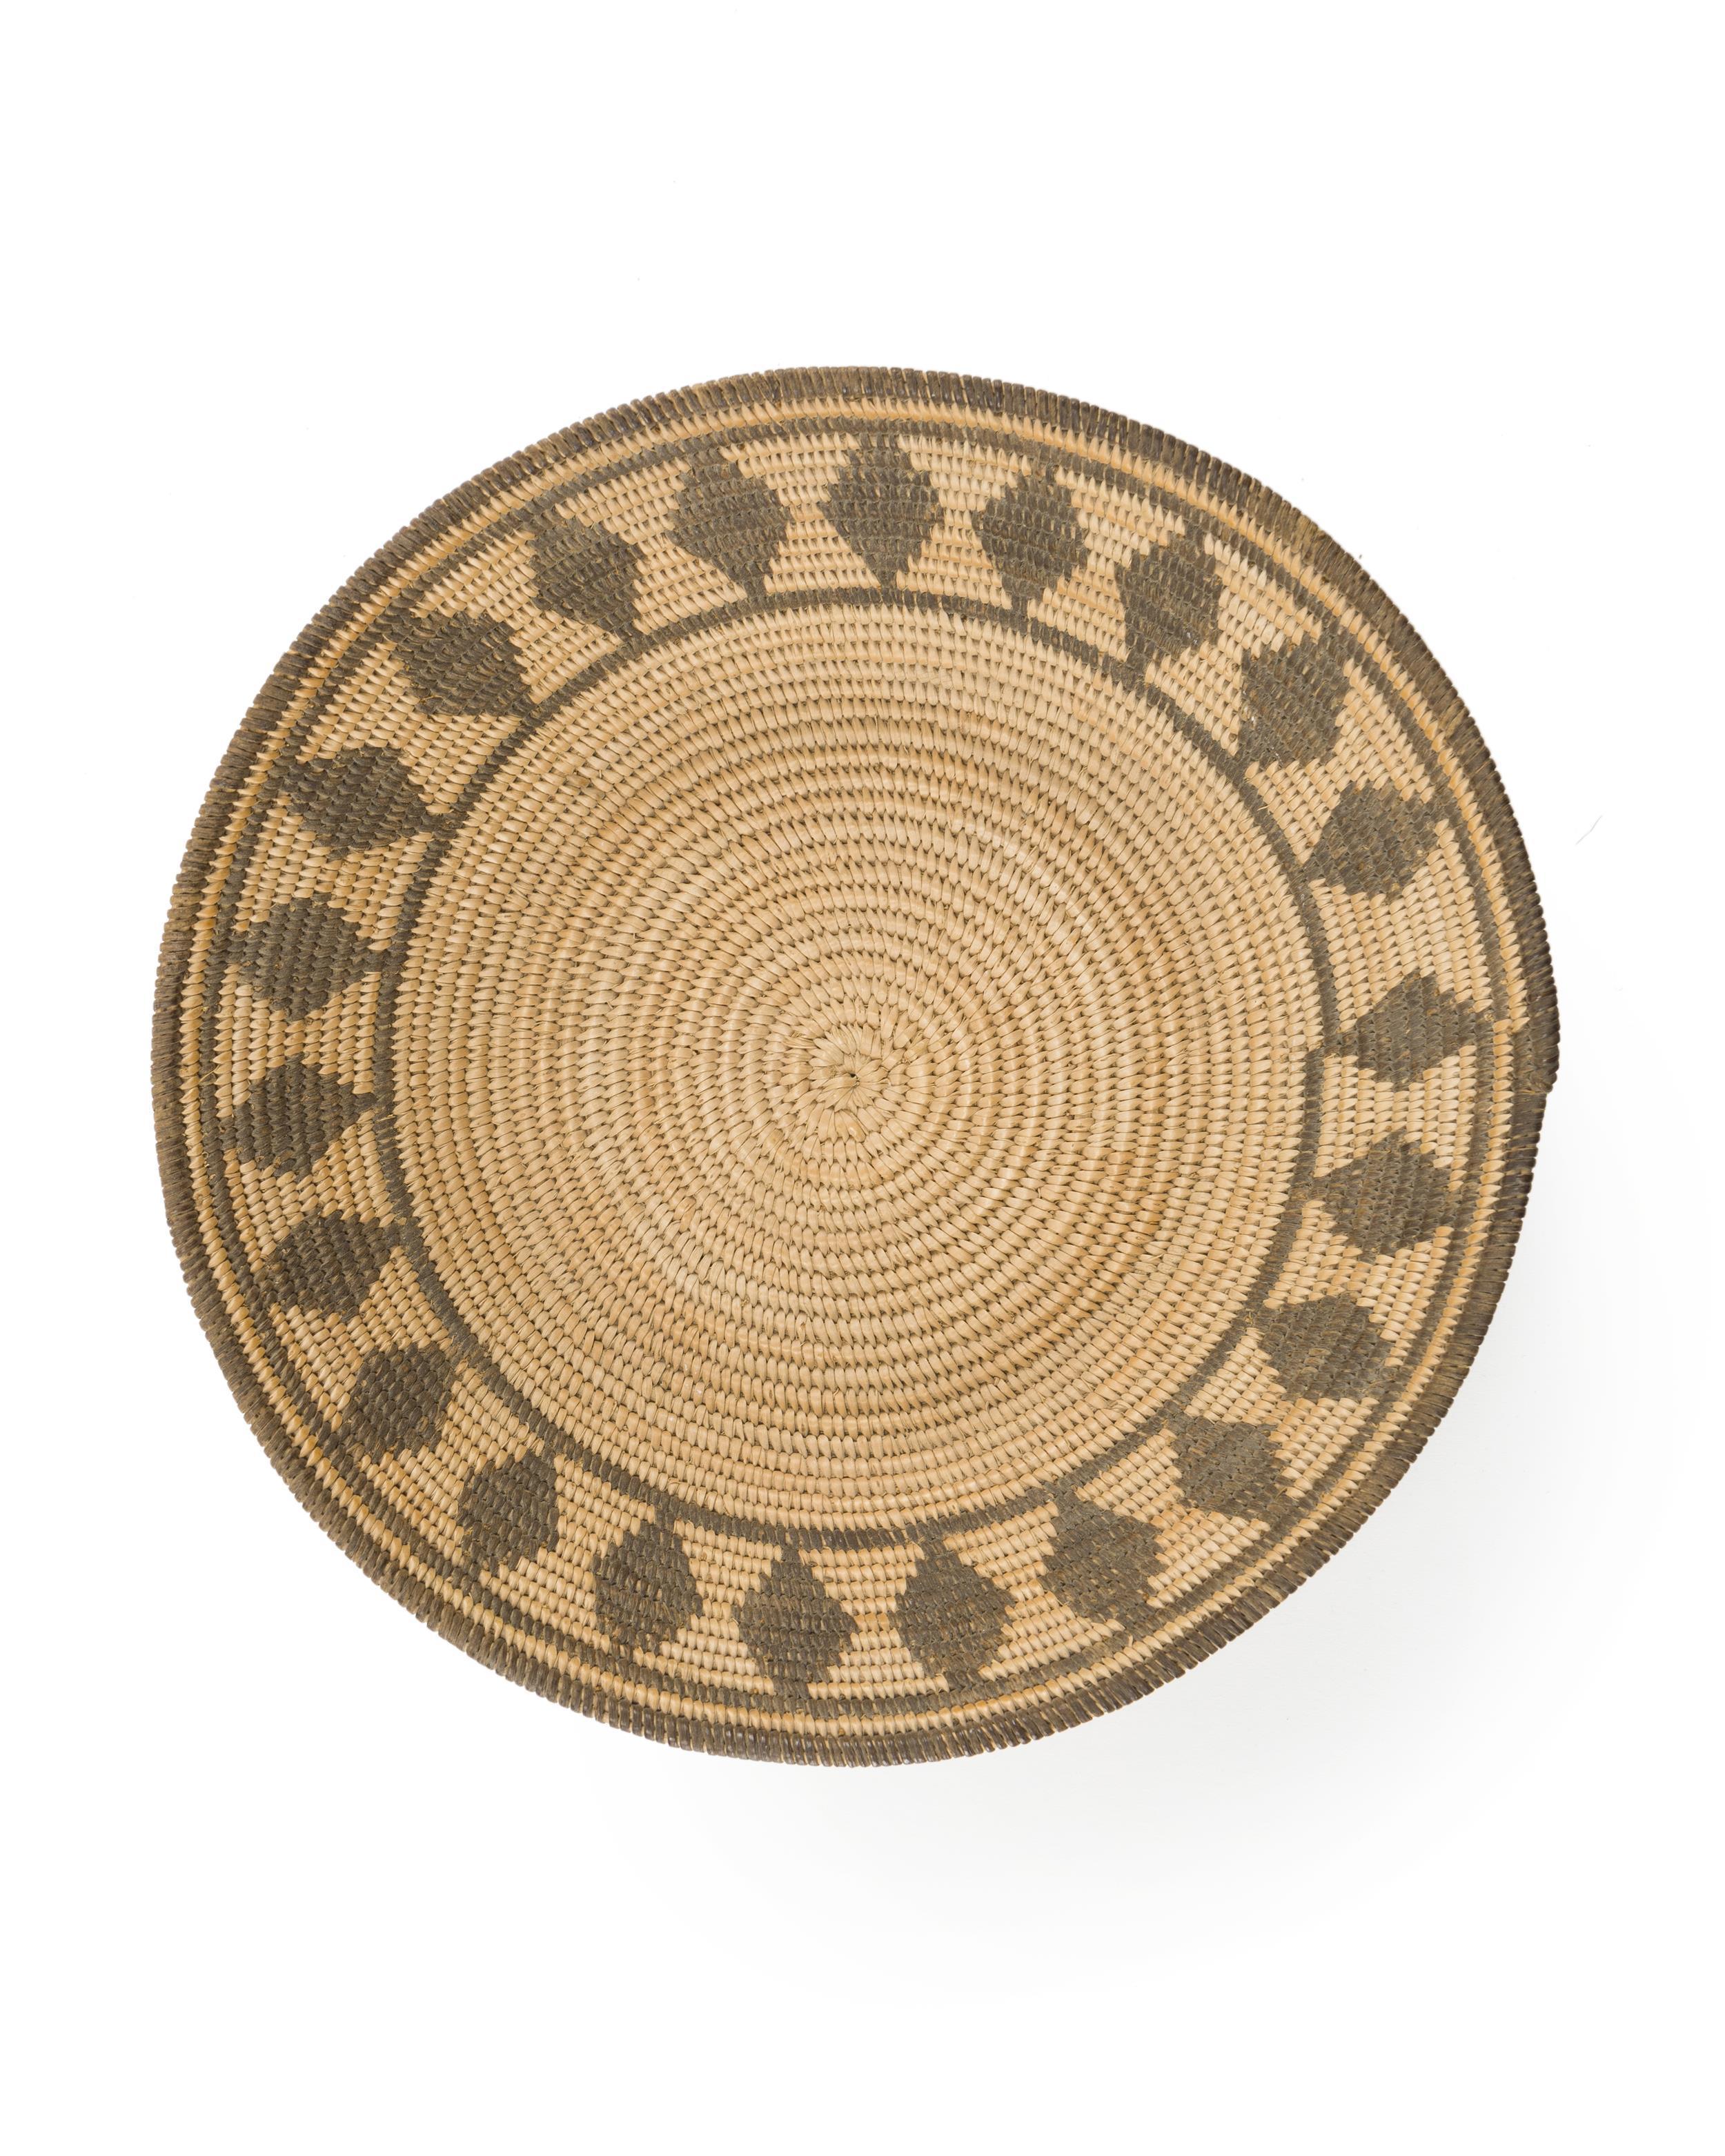 A Chemehuevi basket